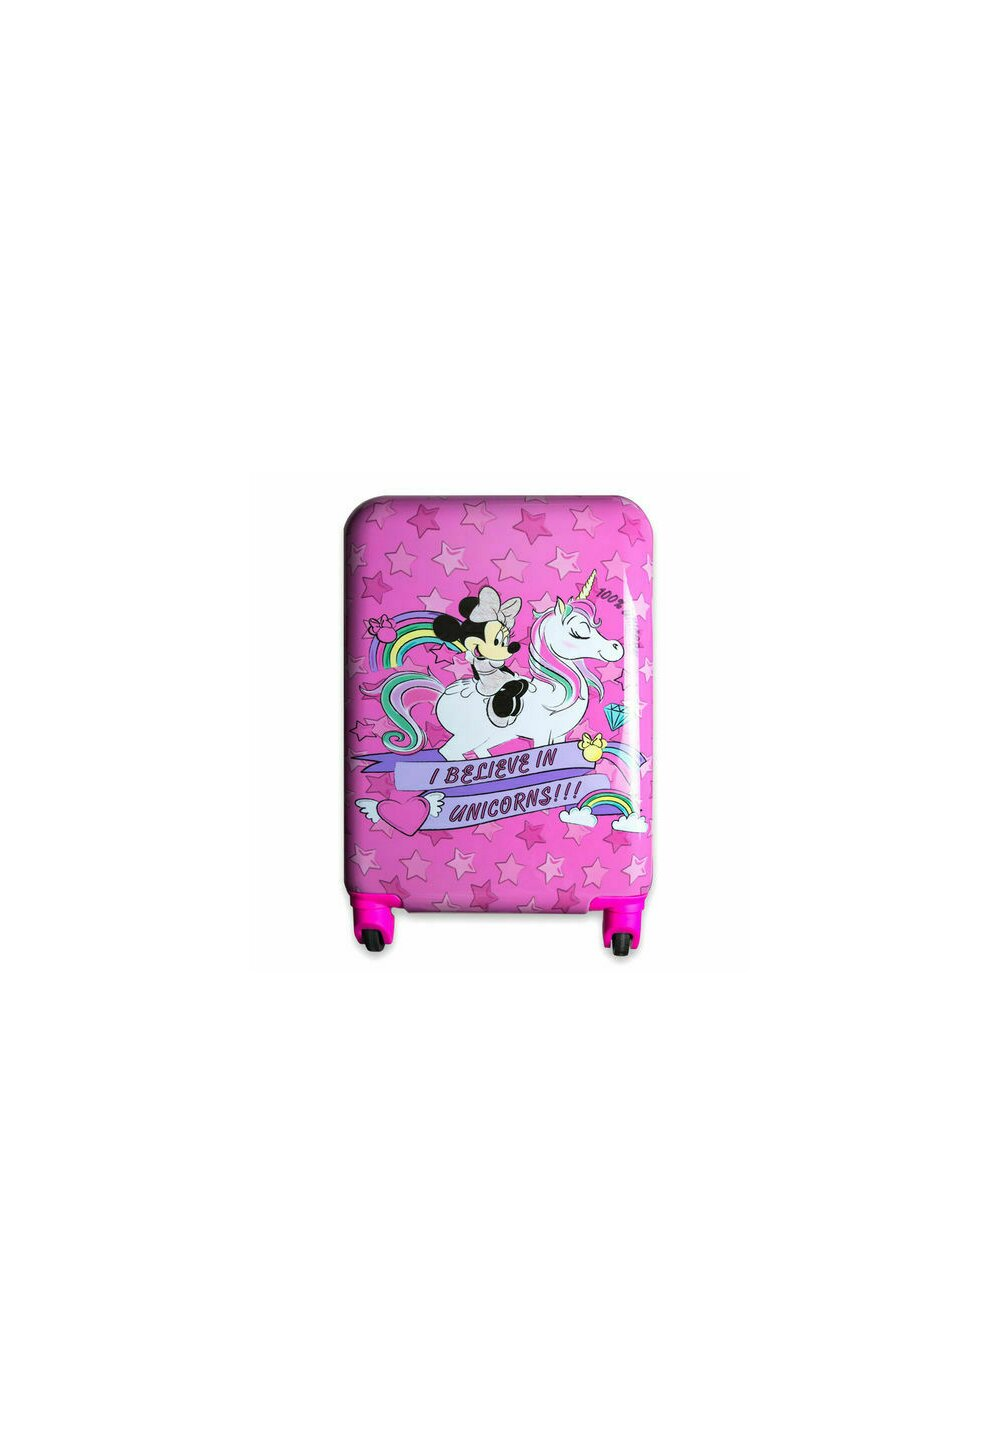 Troller pentru calatorii, I believe in unicorns, roz imagine